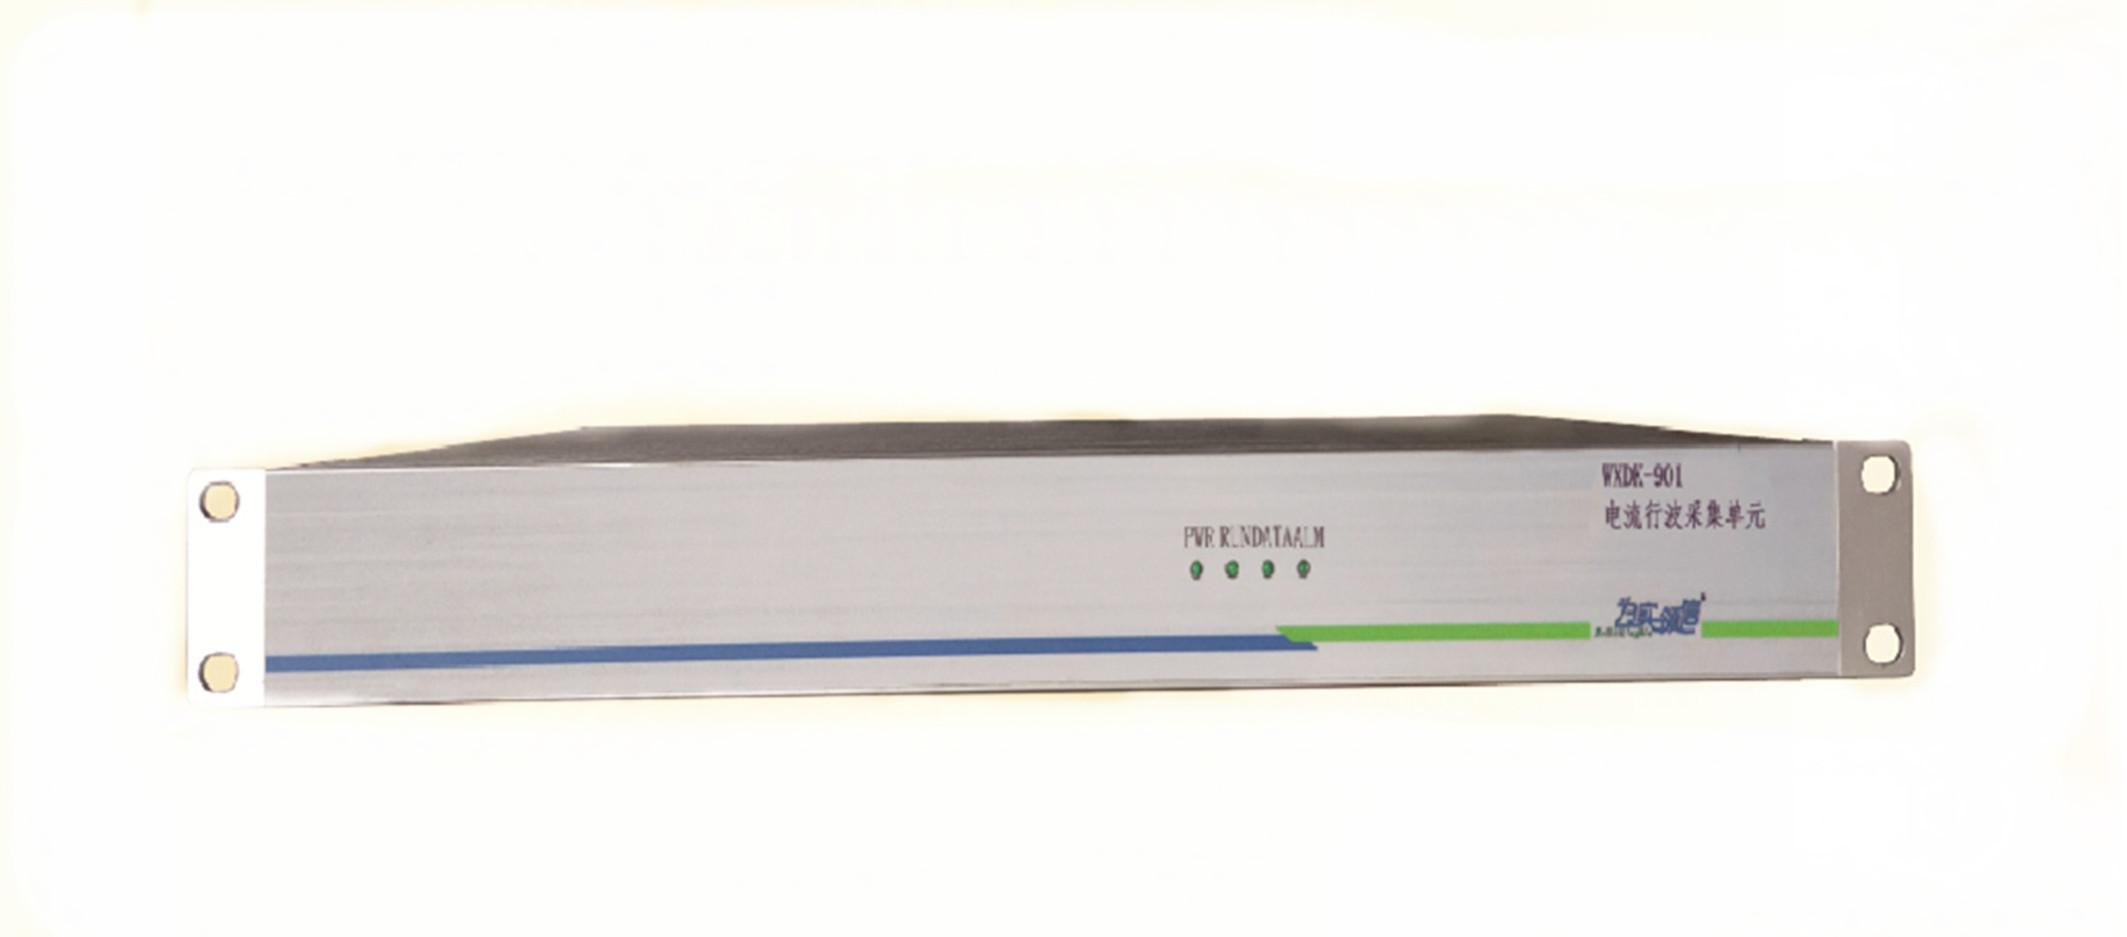 WXDK-901电流行波采集单元